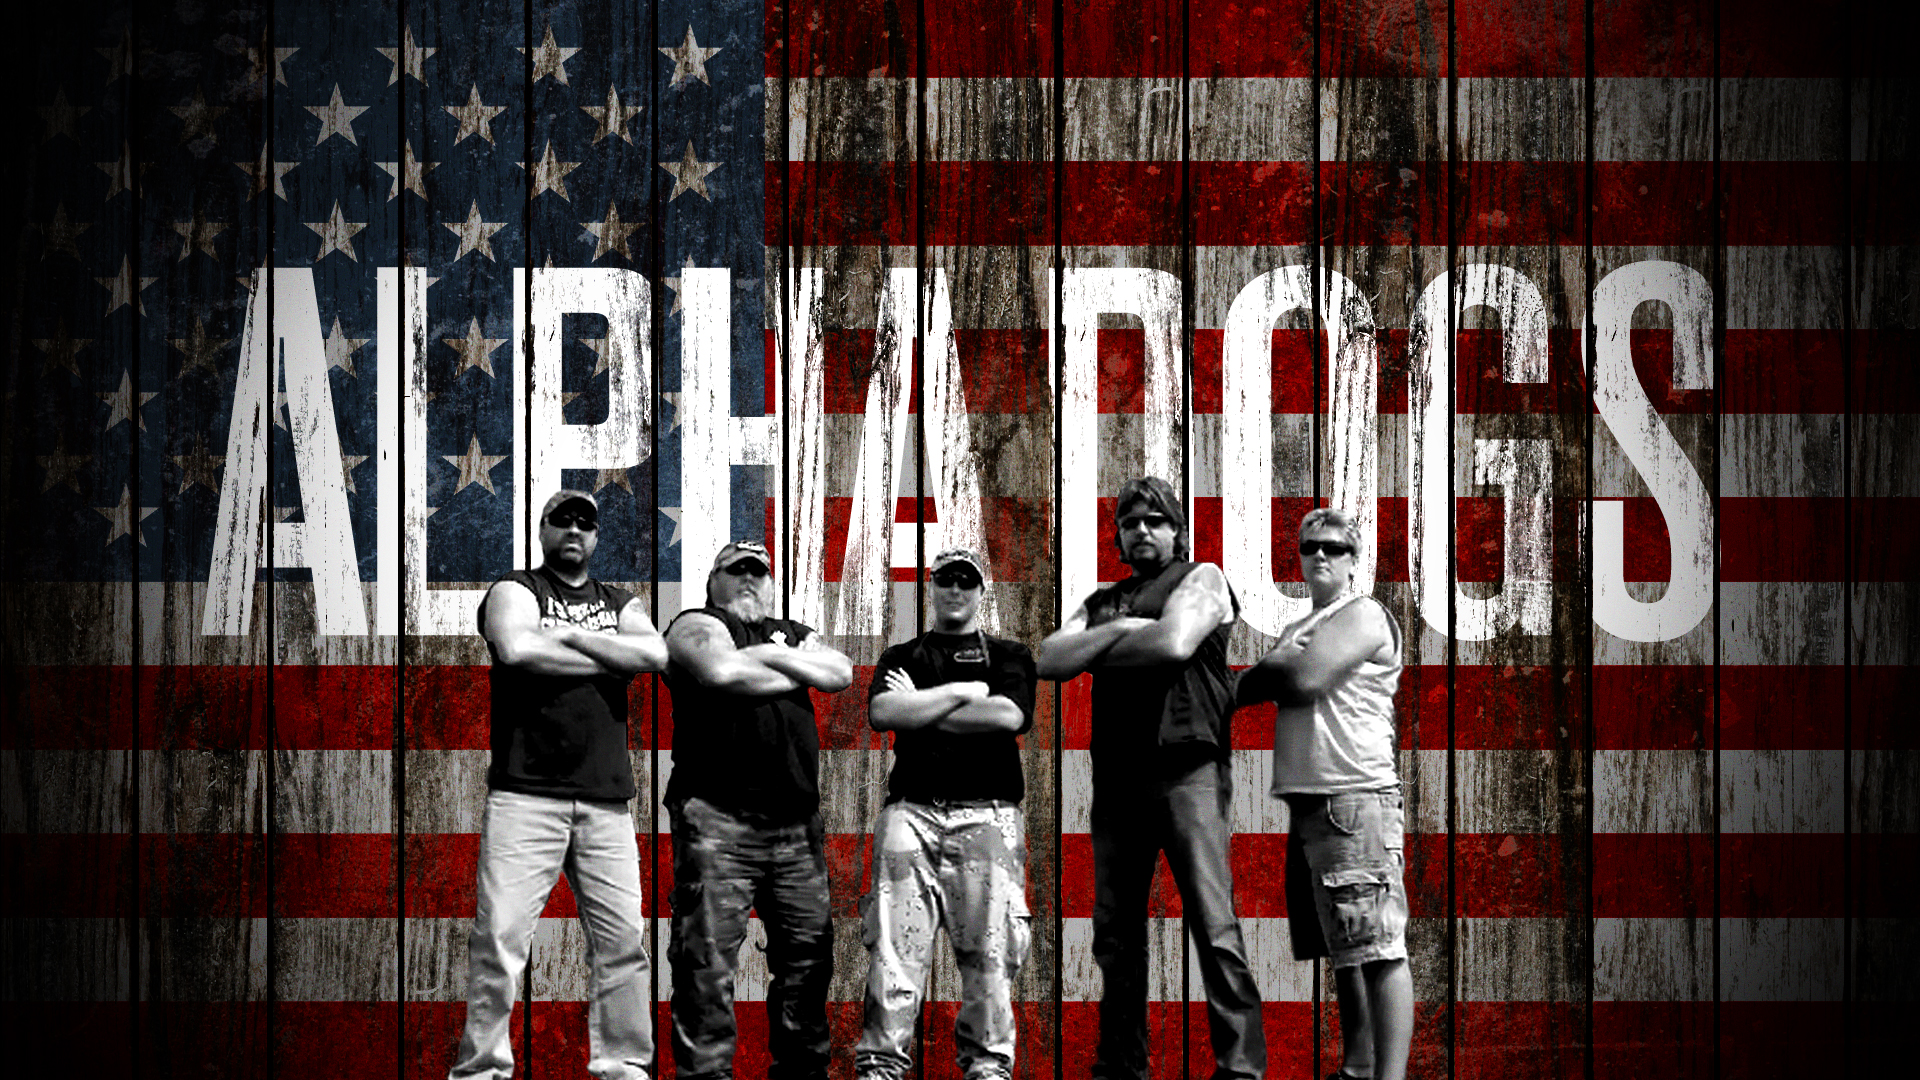 ALP_americana2_gk_12